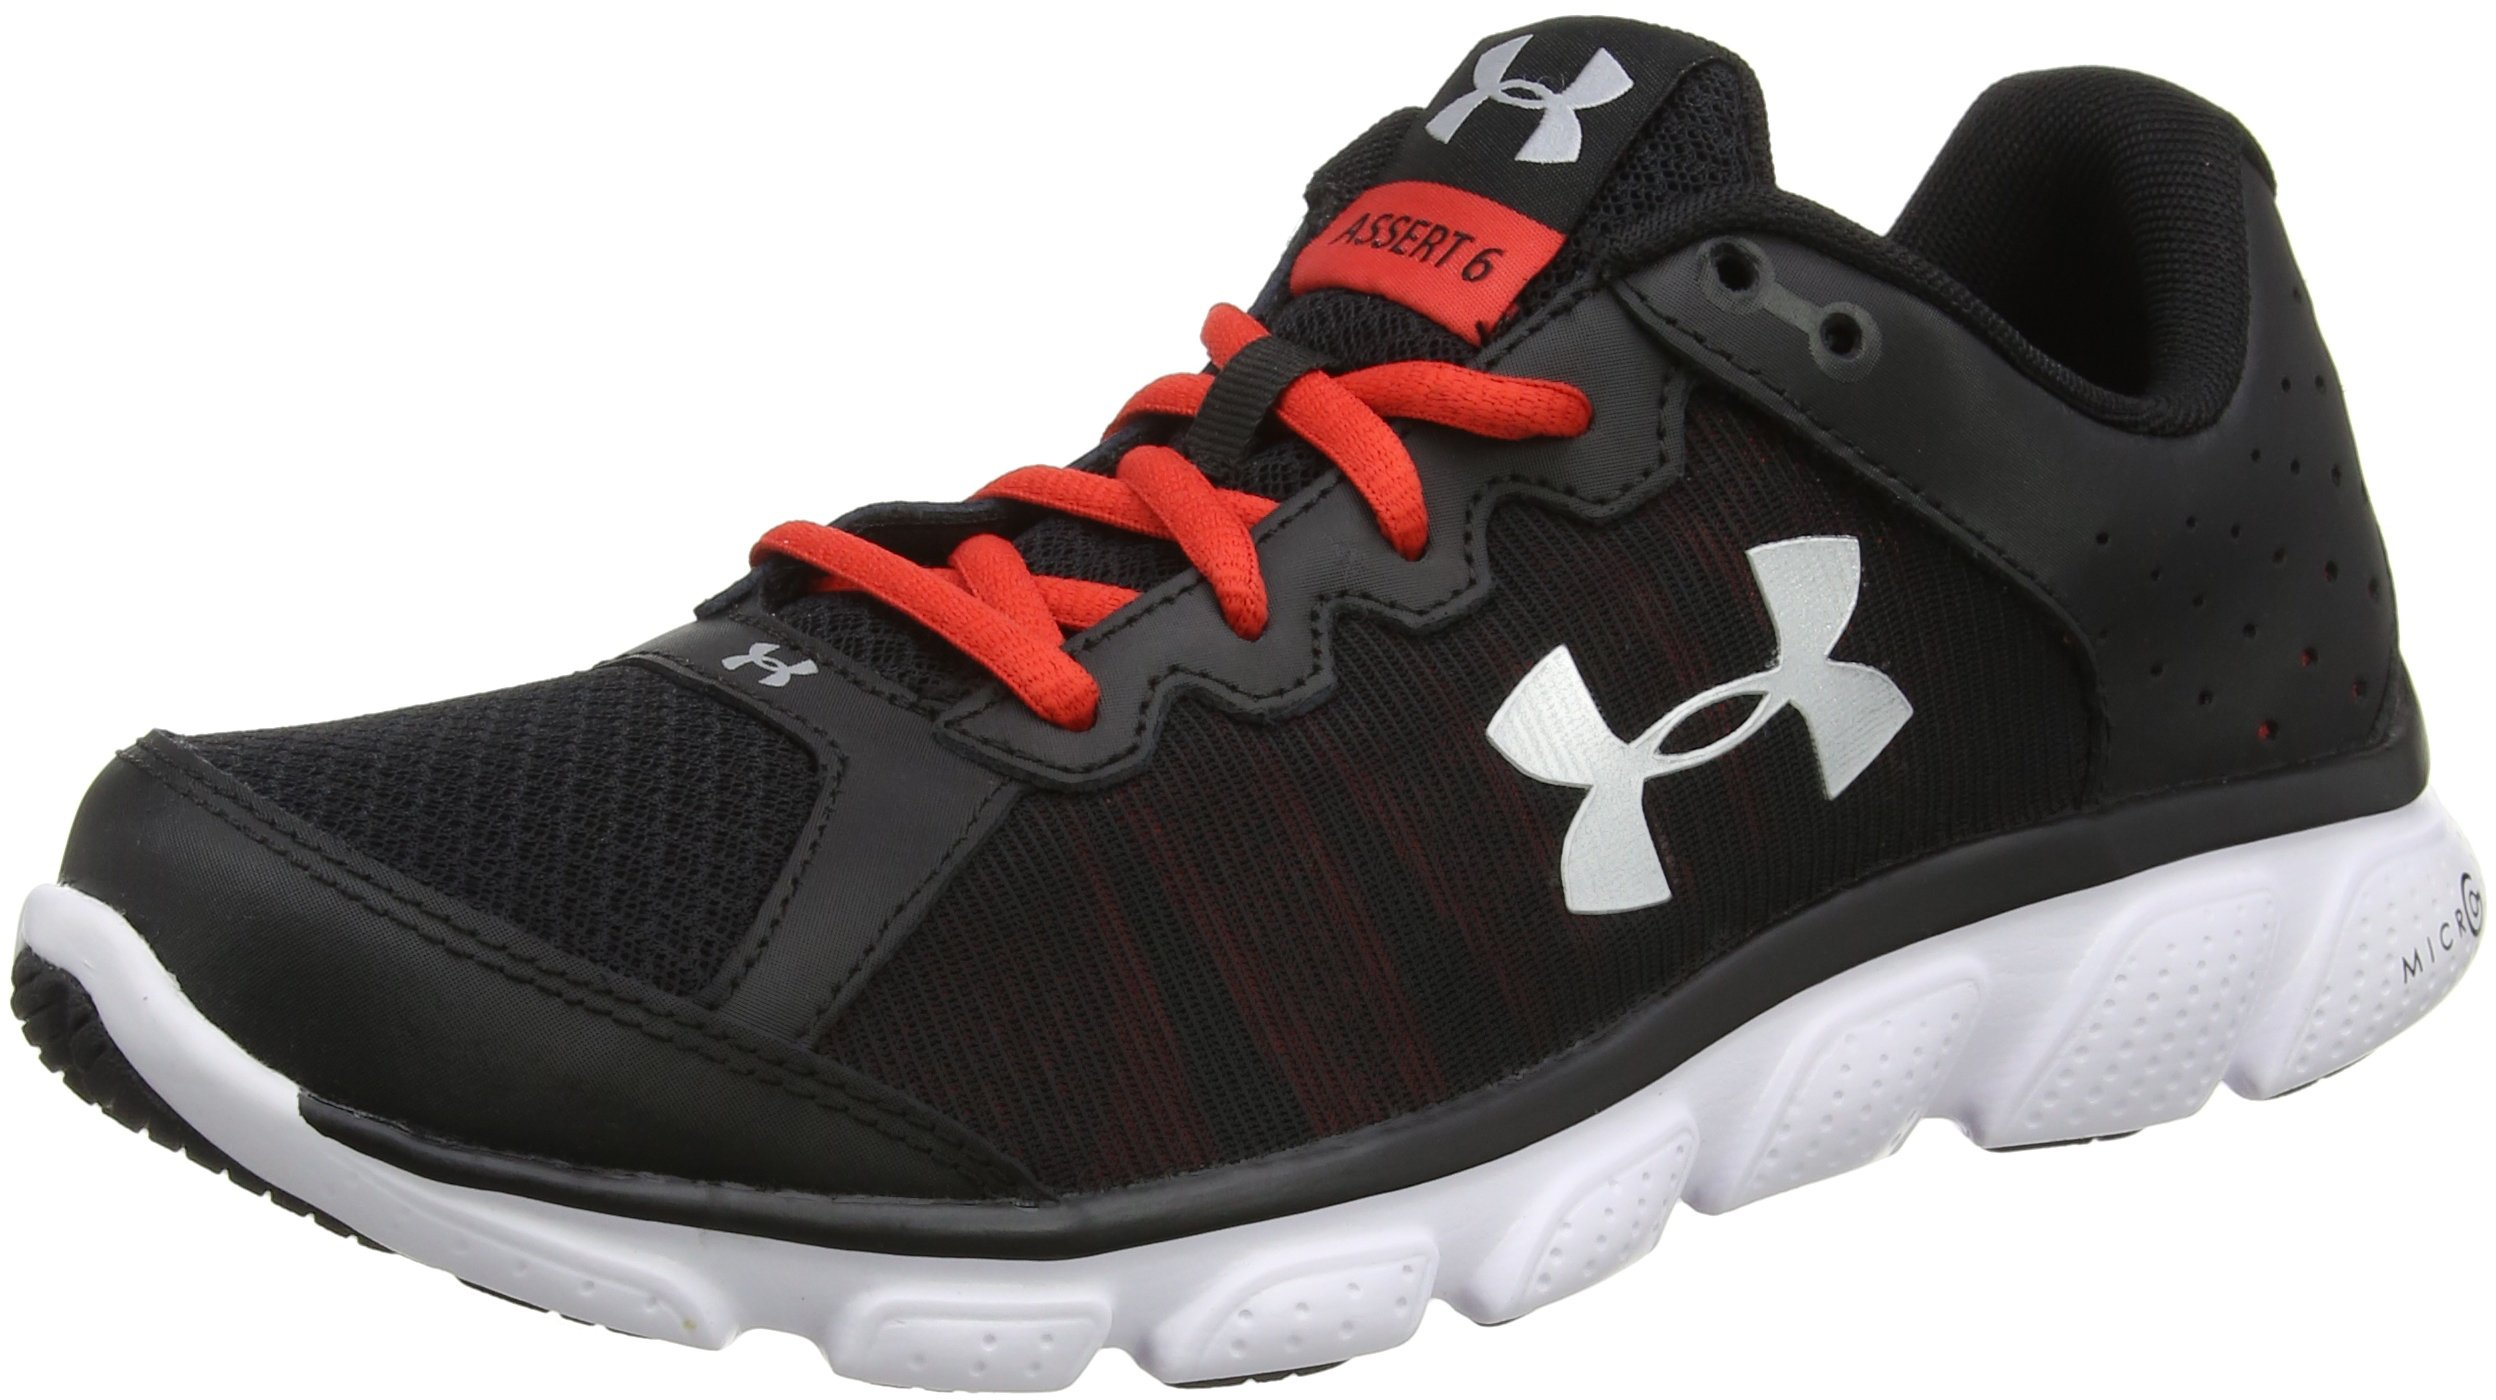 Under Armour Men's UA Micro G Assert 6 Black/Pomegranate/Metallic Silver Athletic Shoe